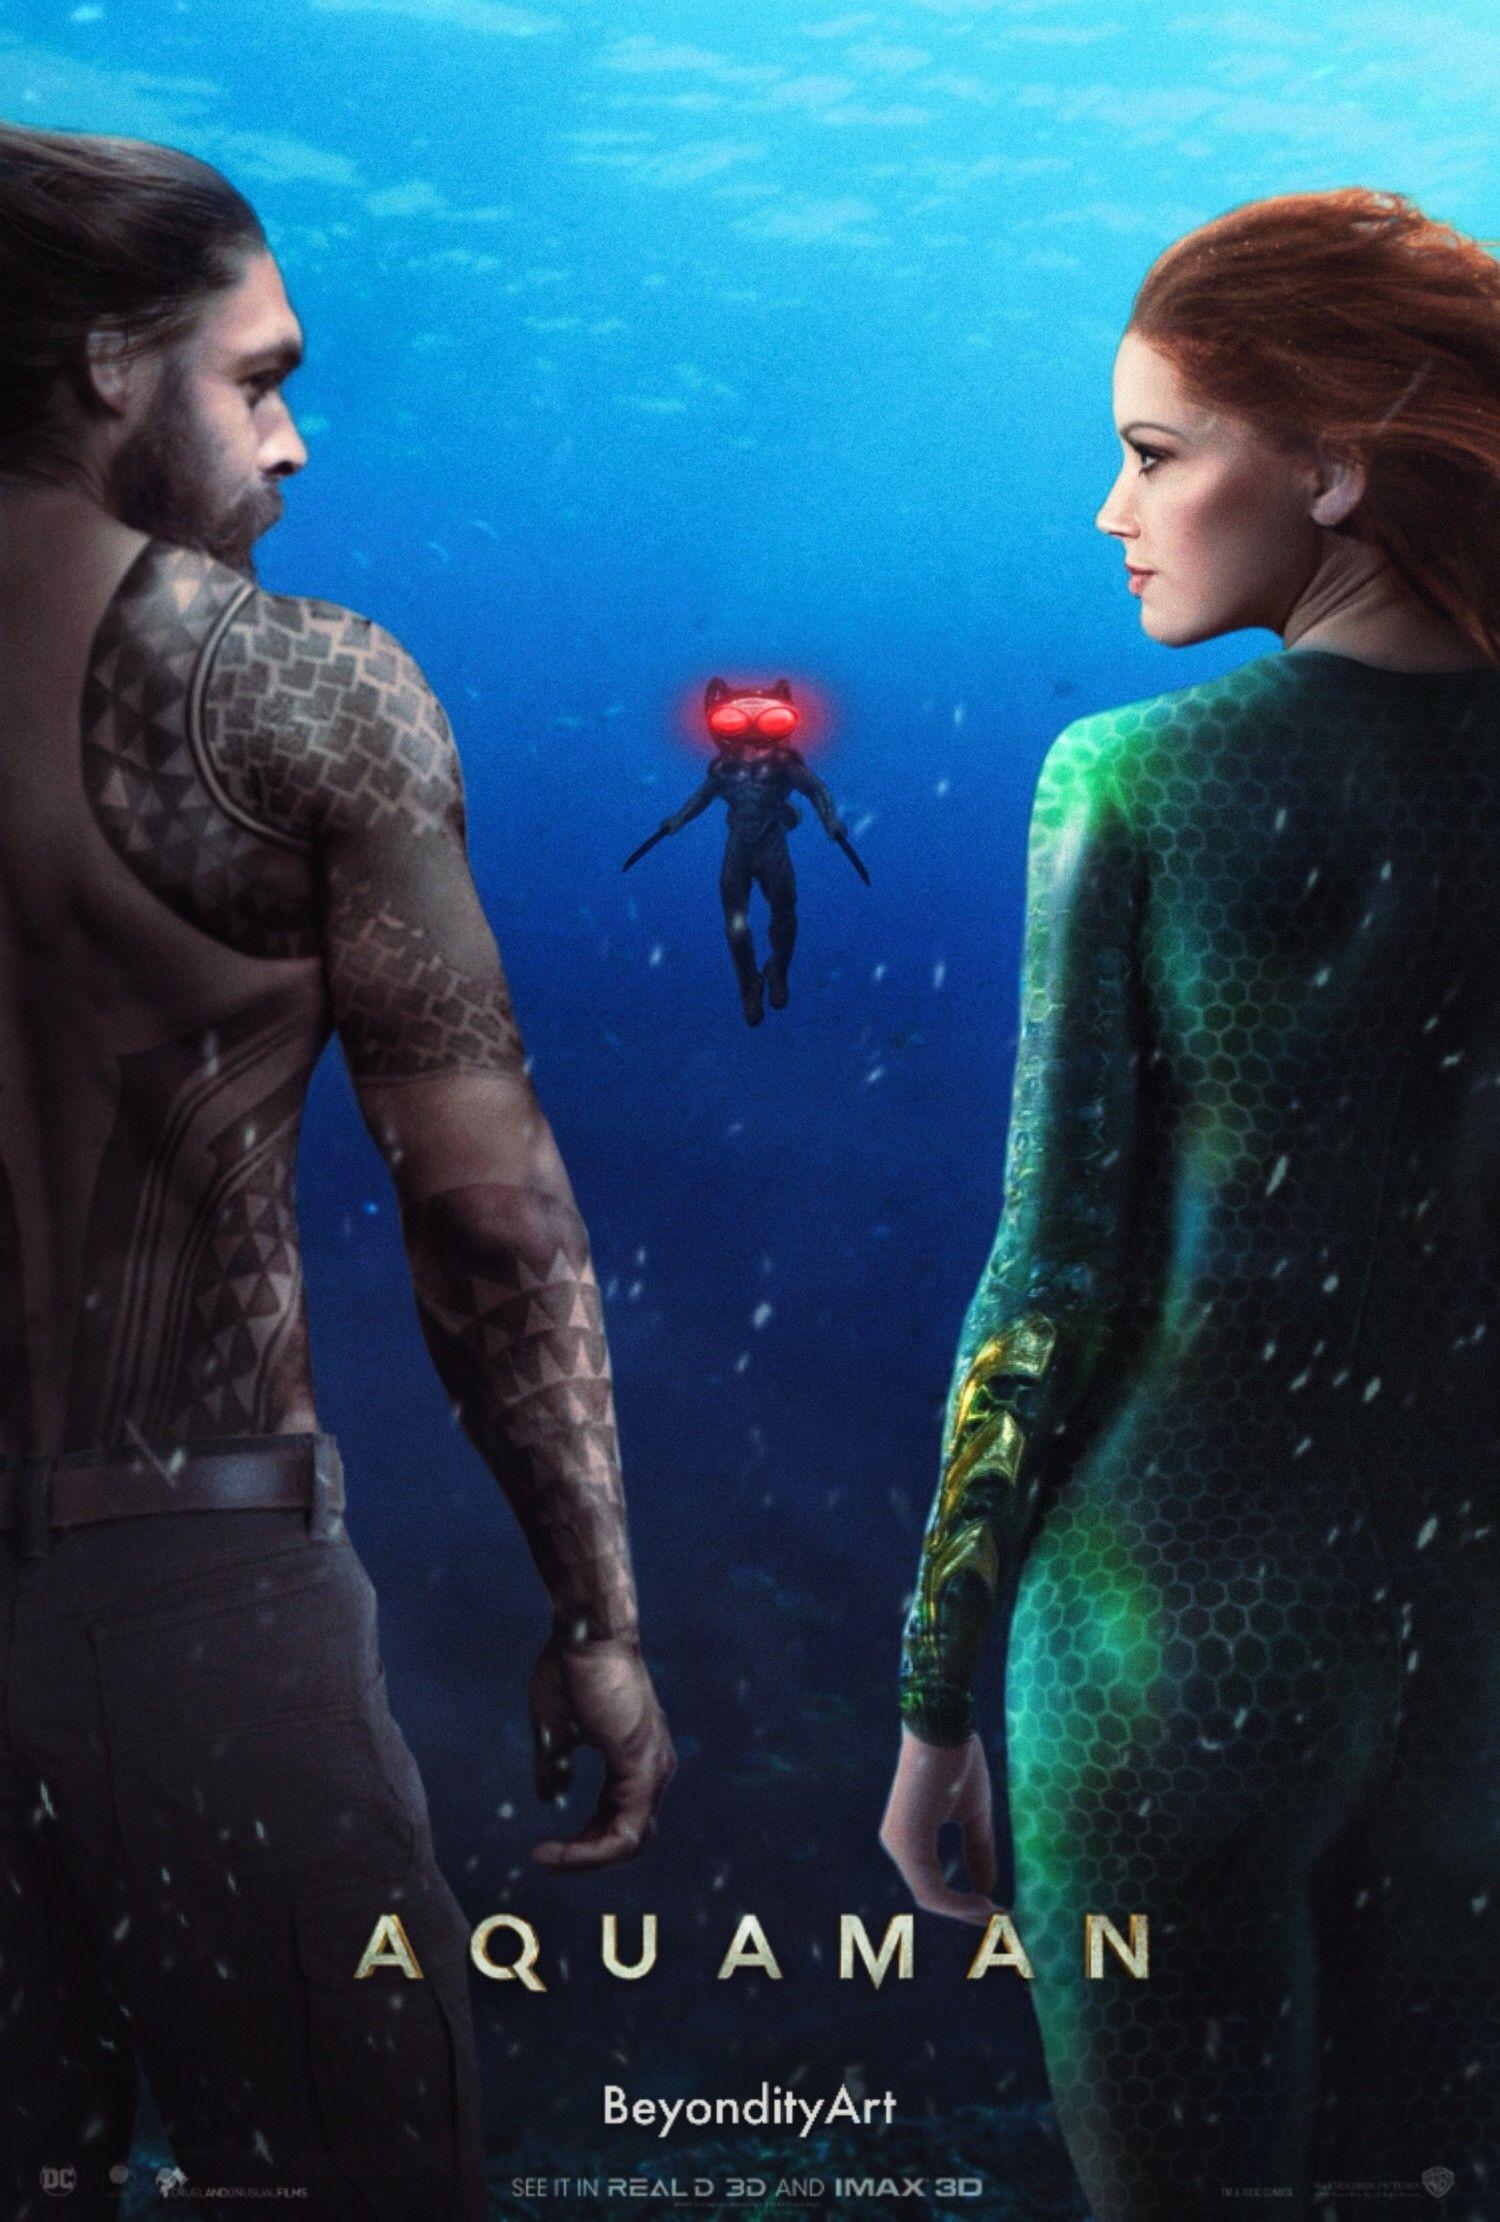 Michael Huang Aquaman 2018 Full Watch Aquaman 2018 Full Online